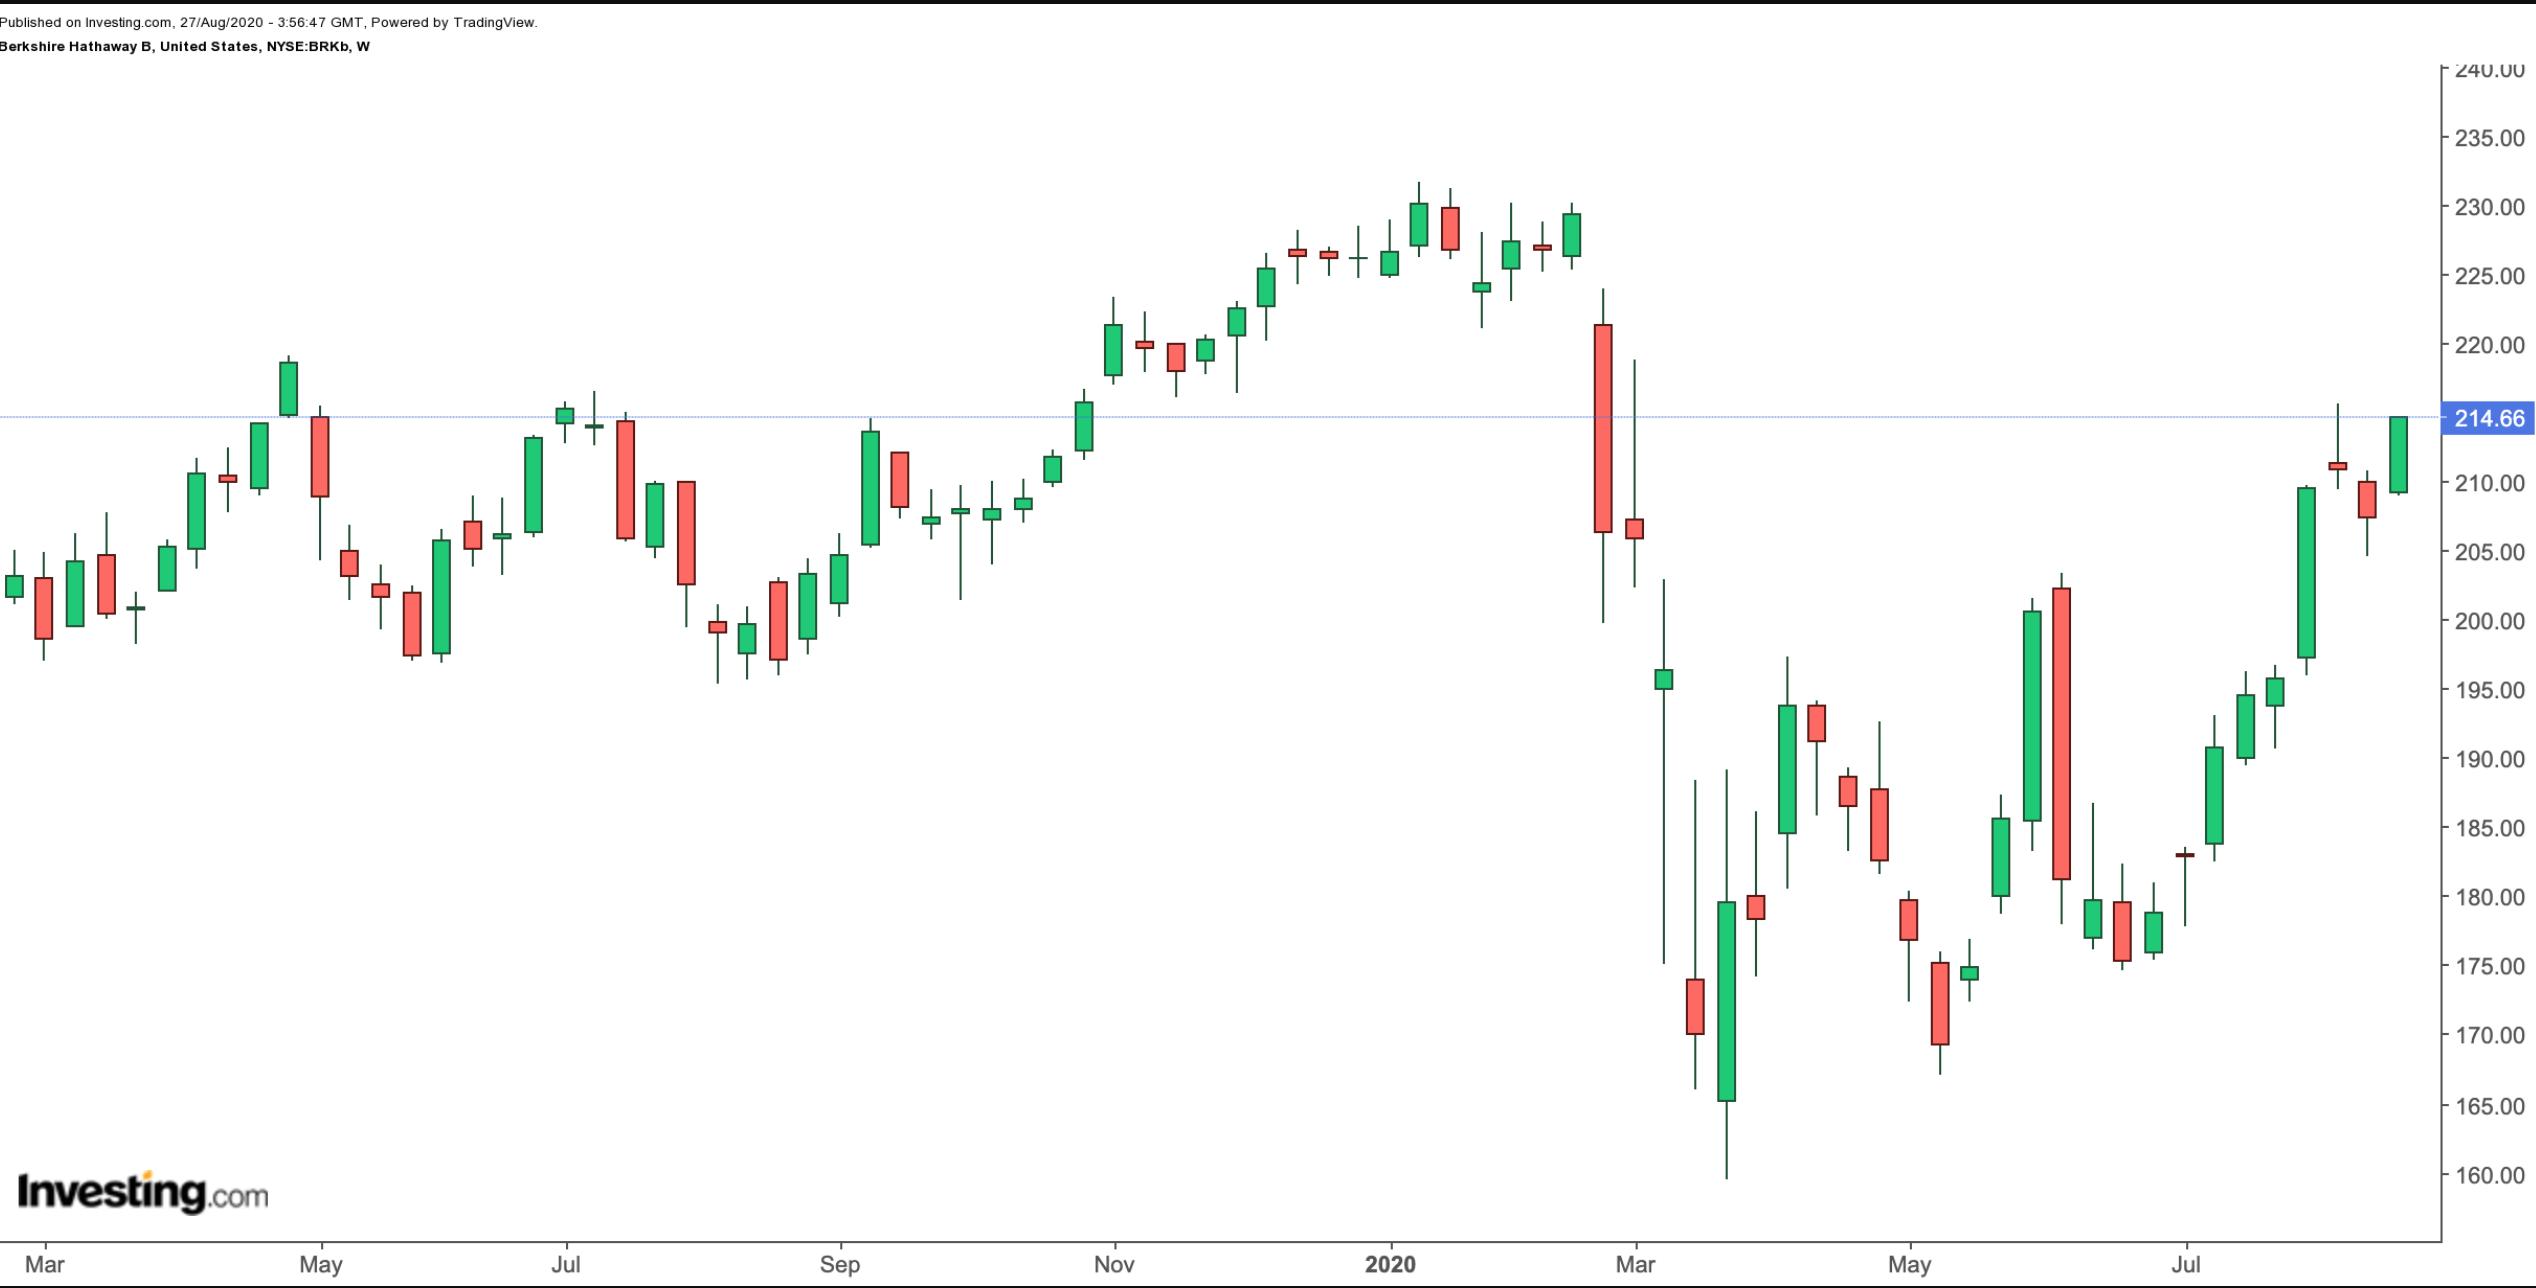 Berkshire Hathaway B Weekly